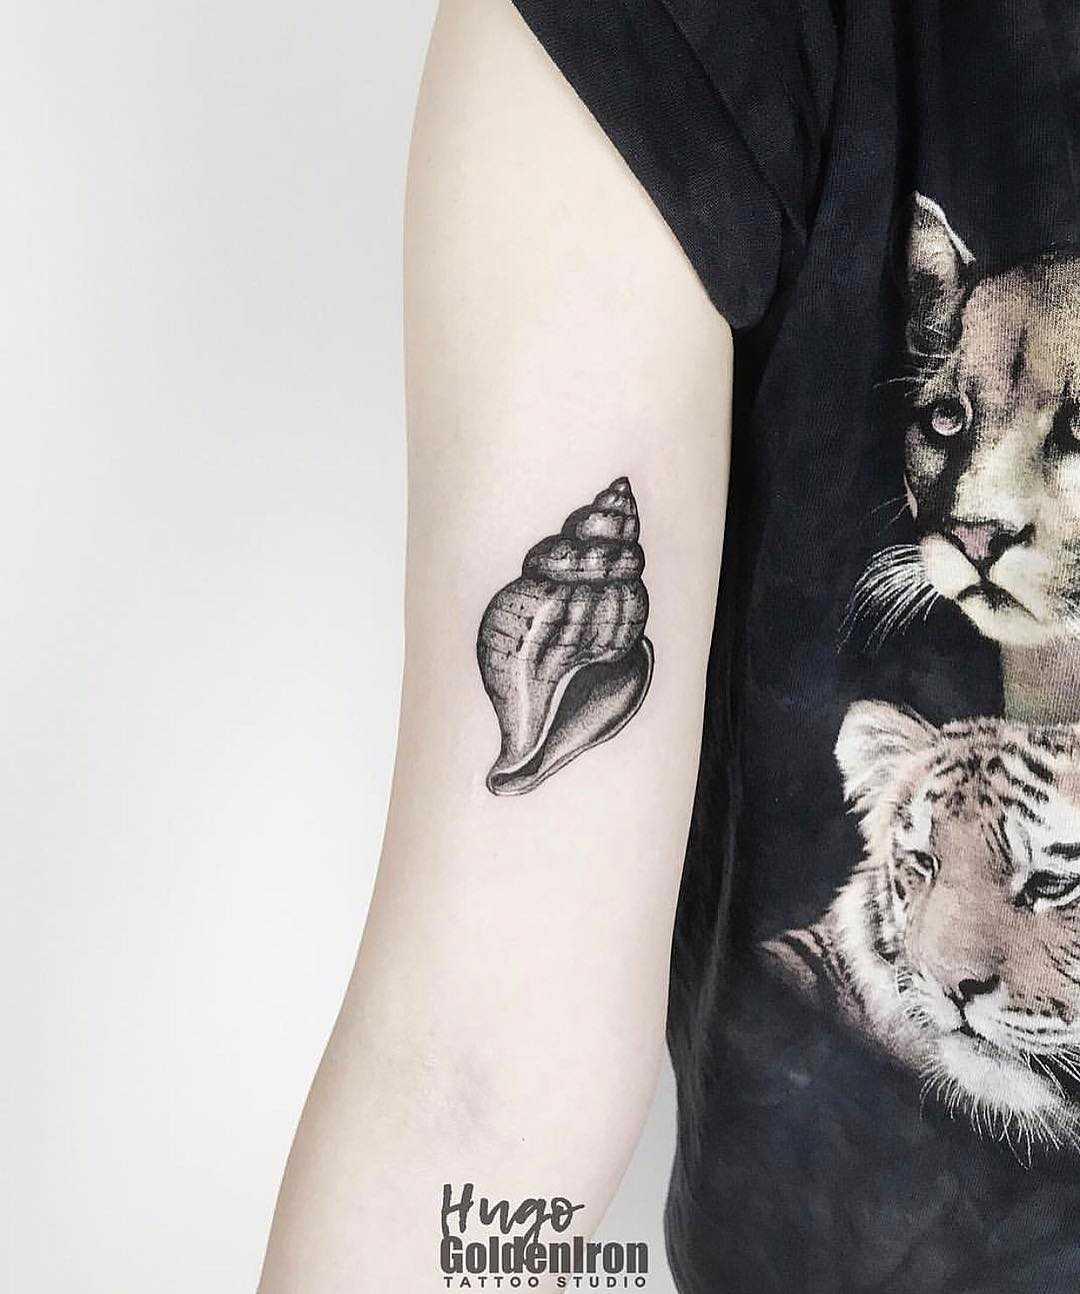 Conch tattoo by hugo